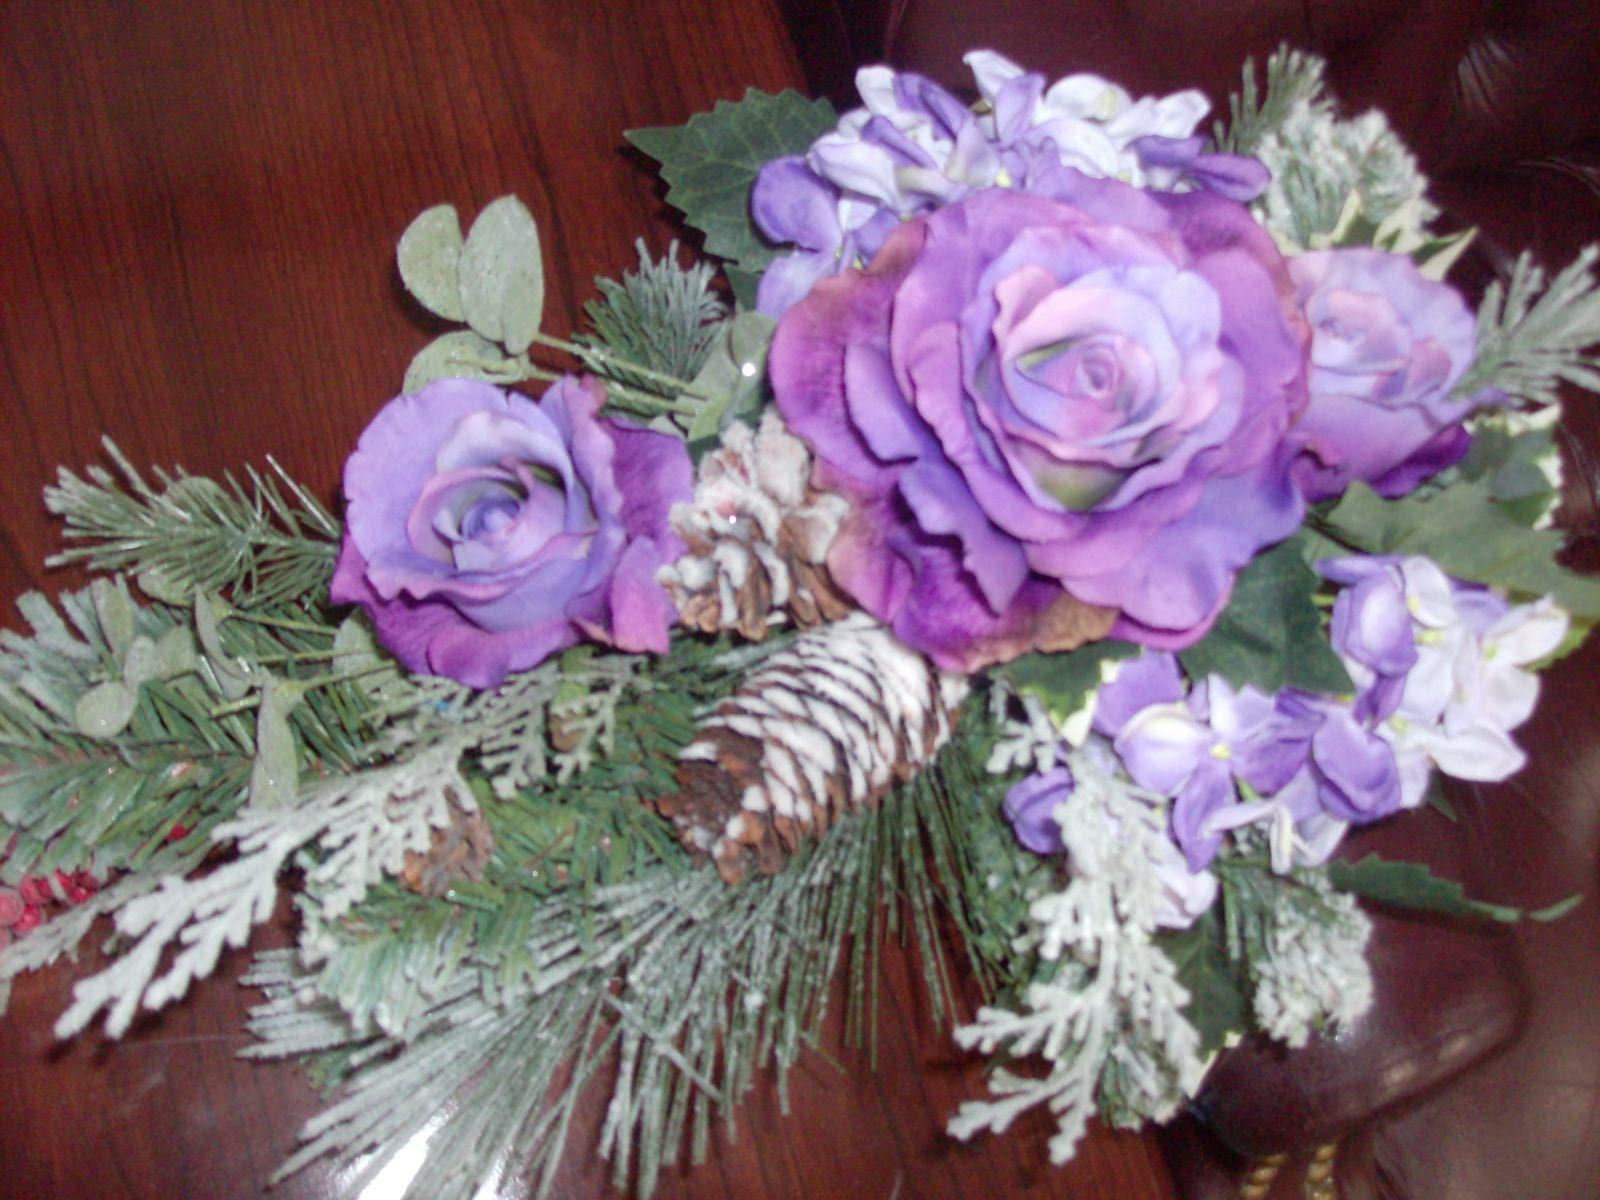 Rustic winter wedding flowers cascade bridal bouquet purple roses rustic winter wedding flowers cascade bridal bouquet purple roses white green or red snow pine cones mistletoe eucalyptus cedar berries izmirmasajfo